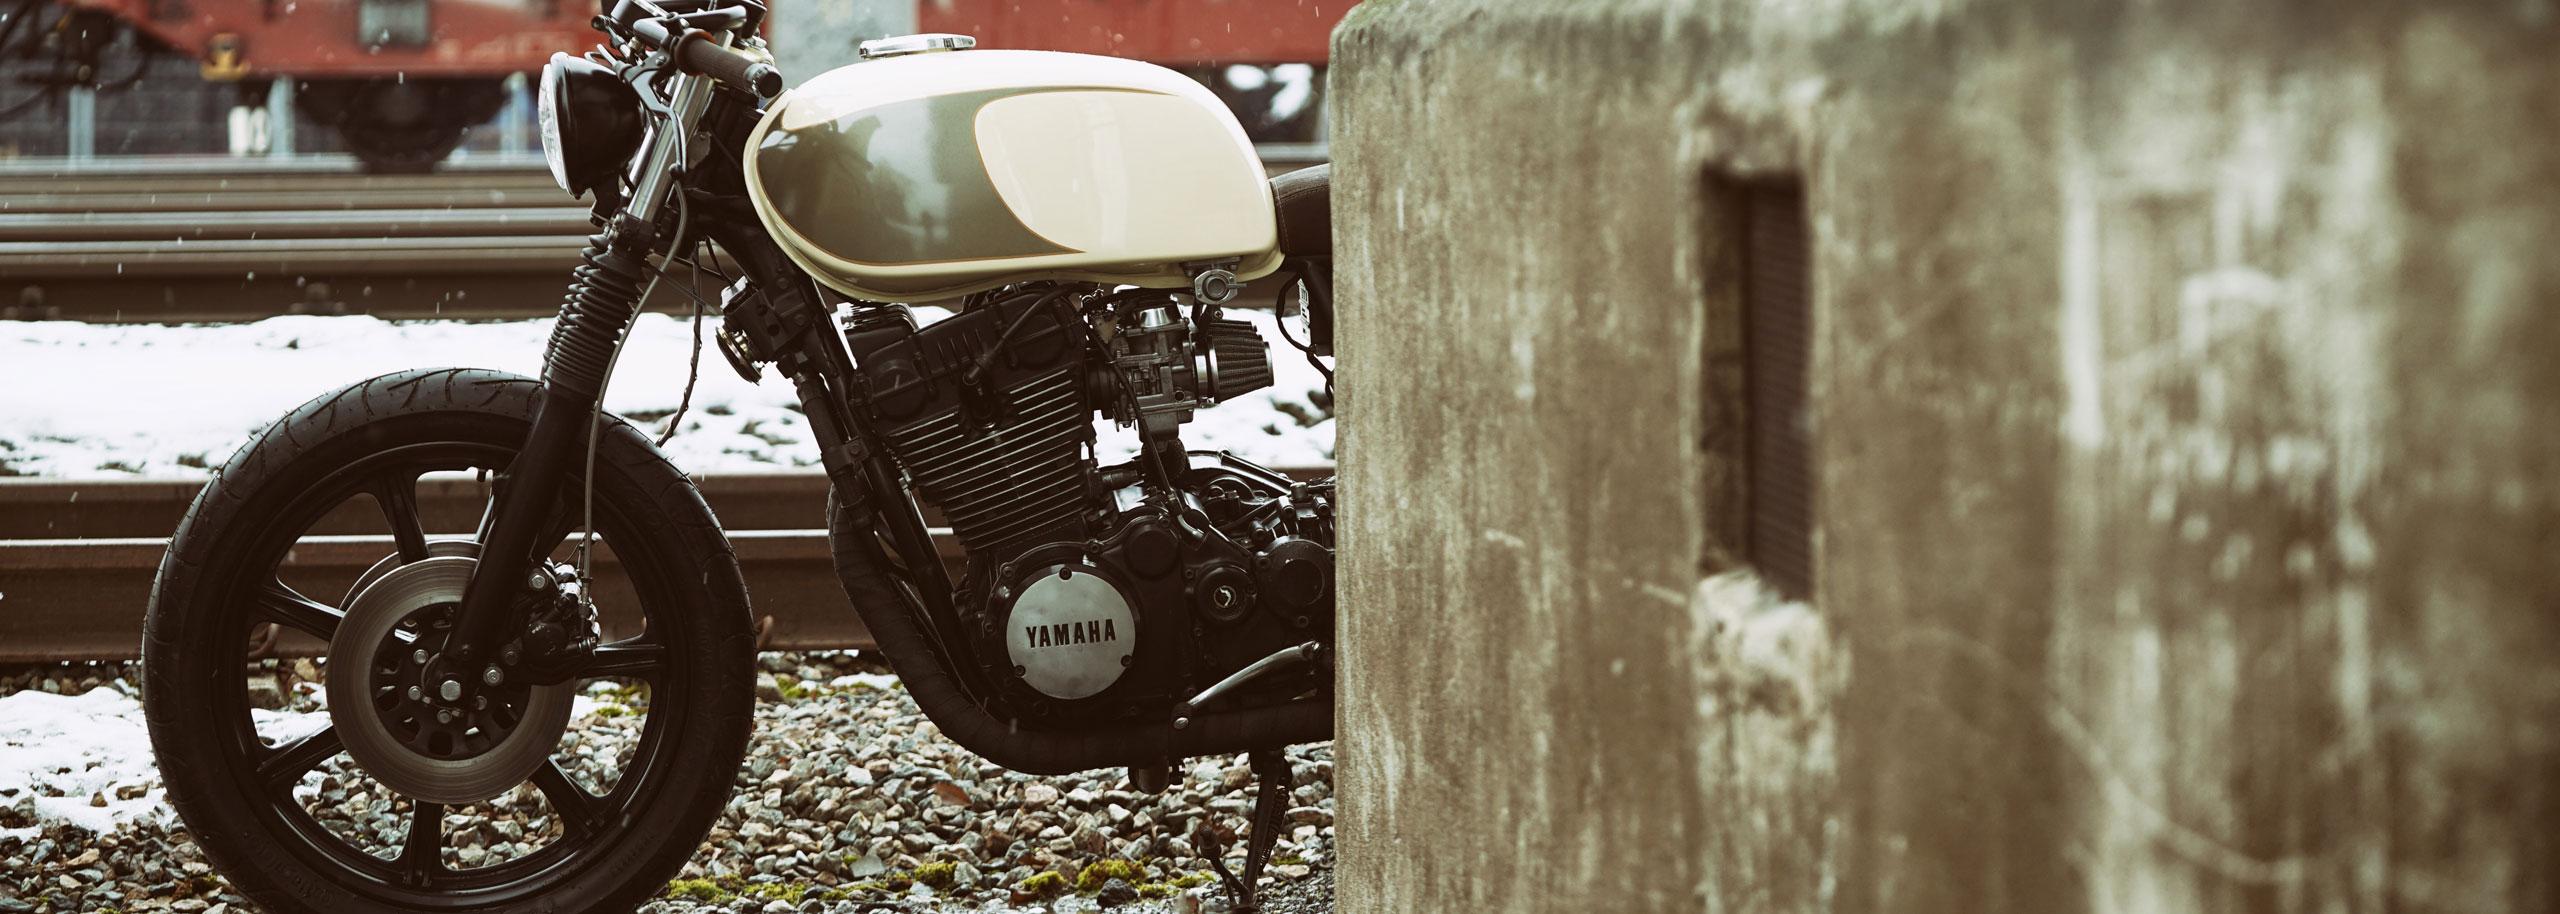 03_TITAN-Heavy-Metal_Honda-Umbau-XS-850_Cafe-Racer-Graz-Motorrad-Umbau-Austria-Vintage_Custom-Bikes-Sattel-Heck-Umbau